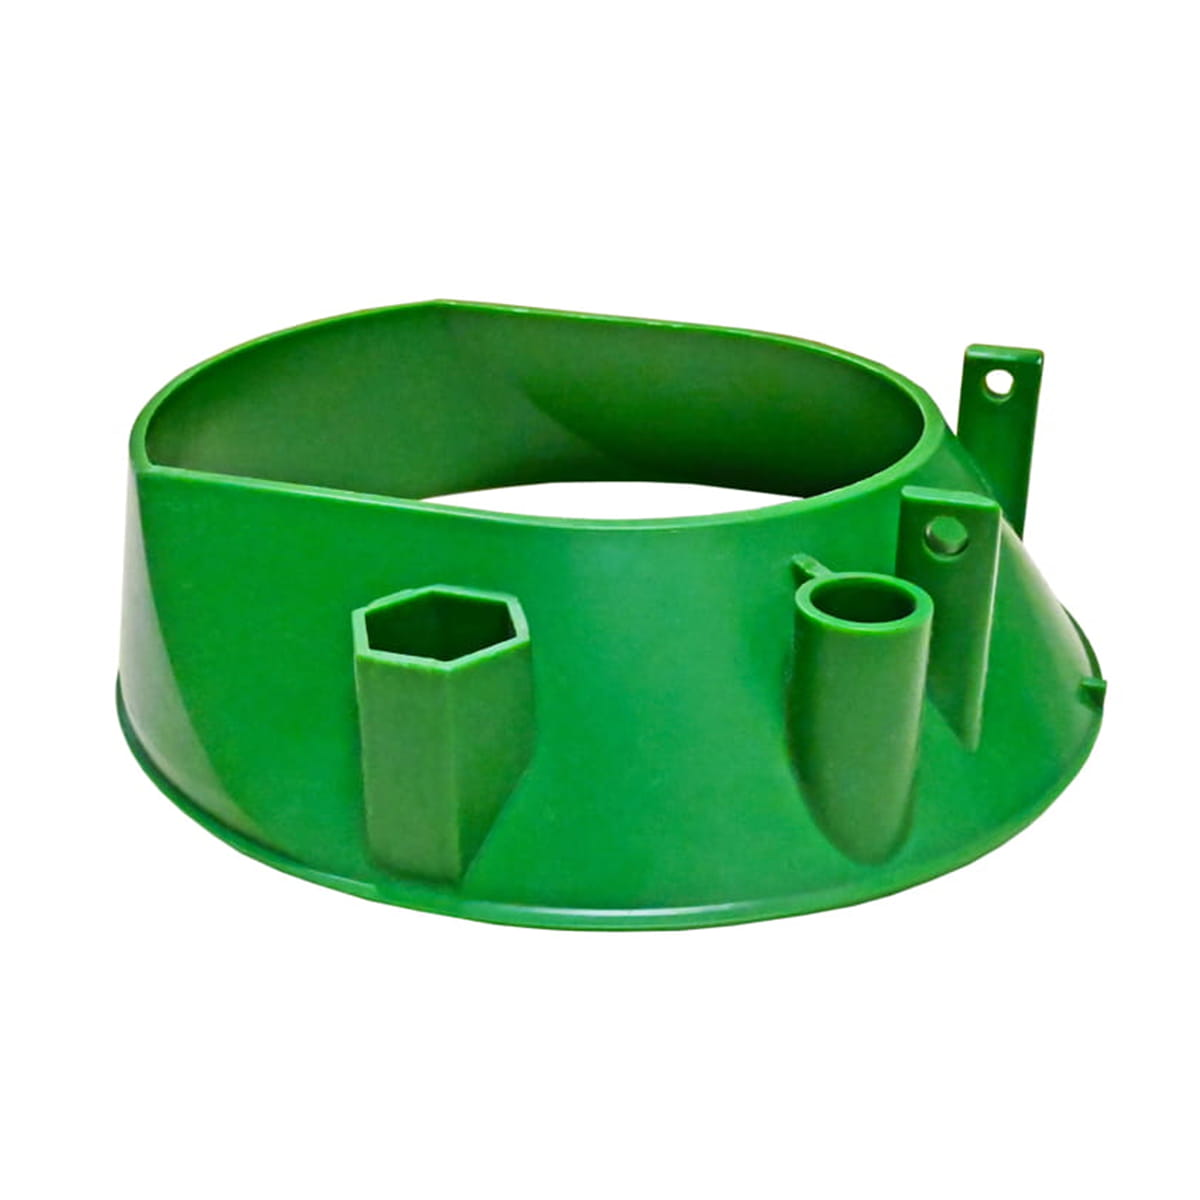 cono interior clutch verde